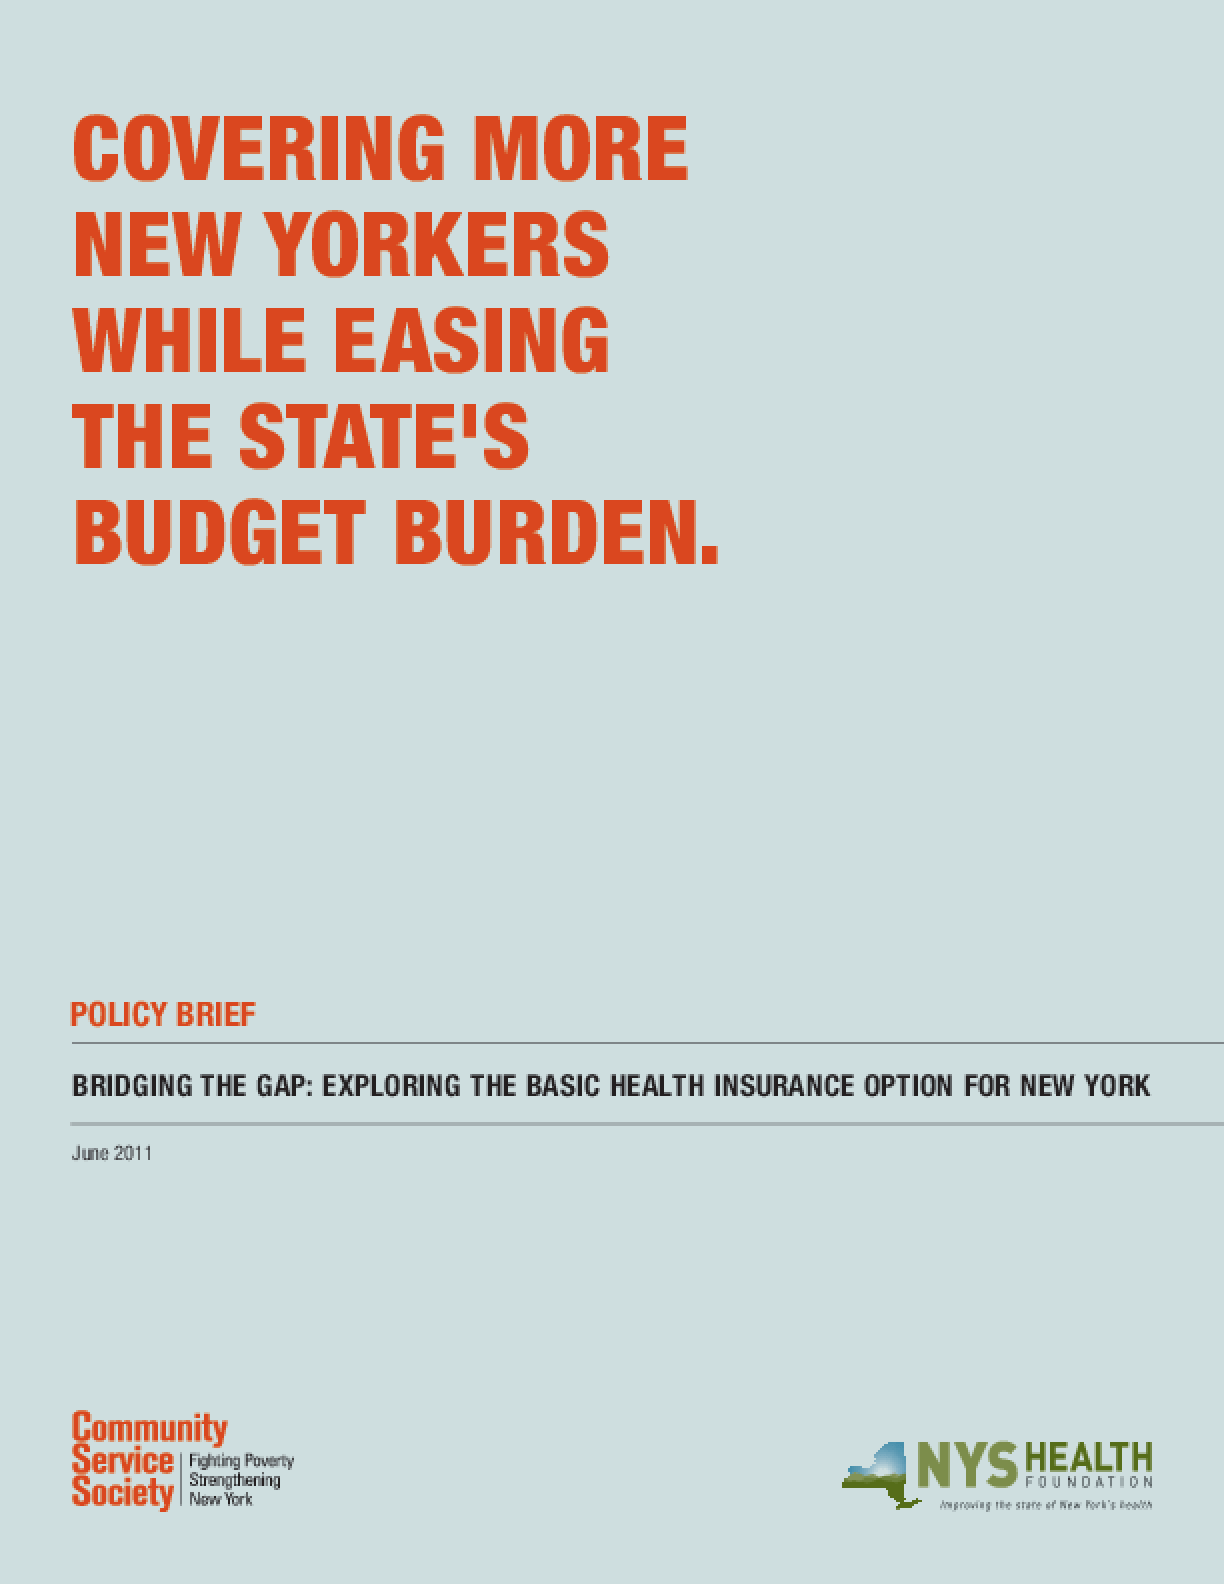 Bridging the Gap: Exploring the Basic Health Insurance Option for New York